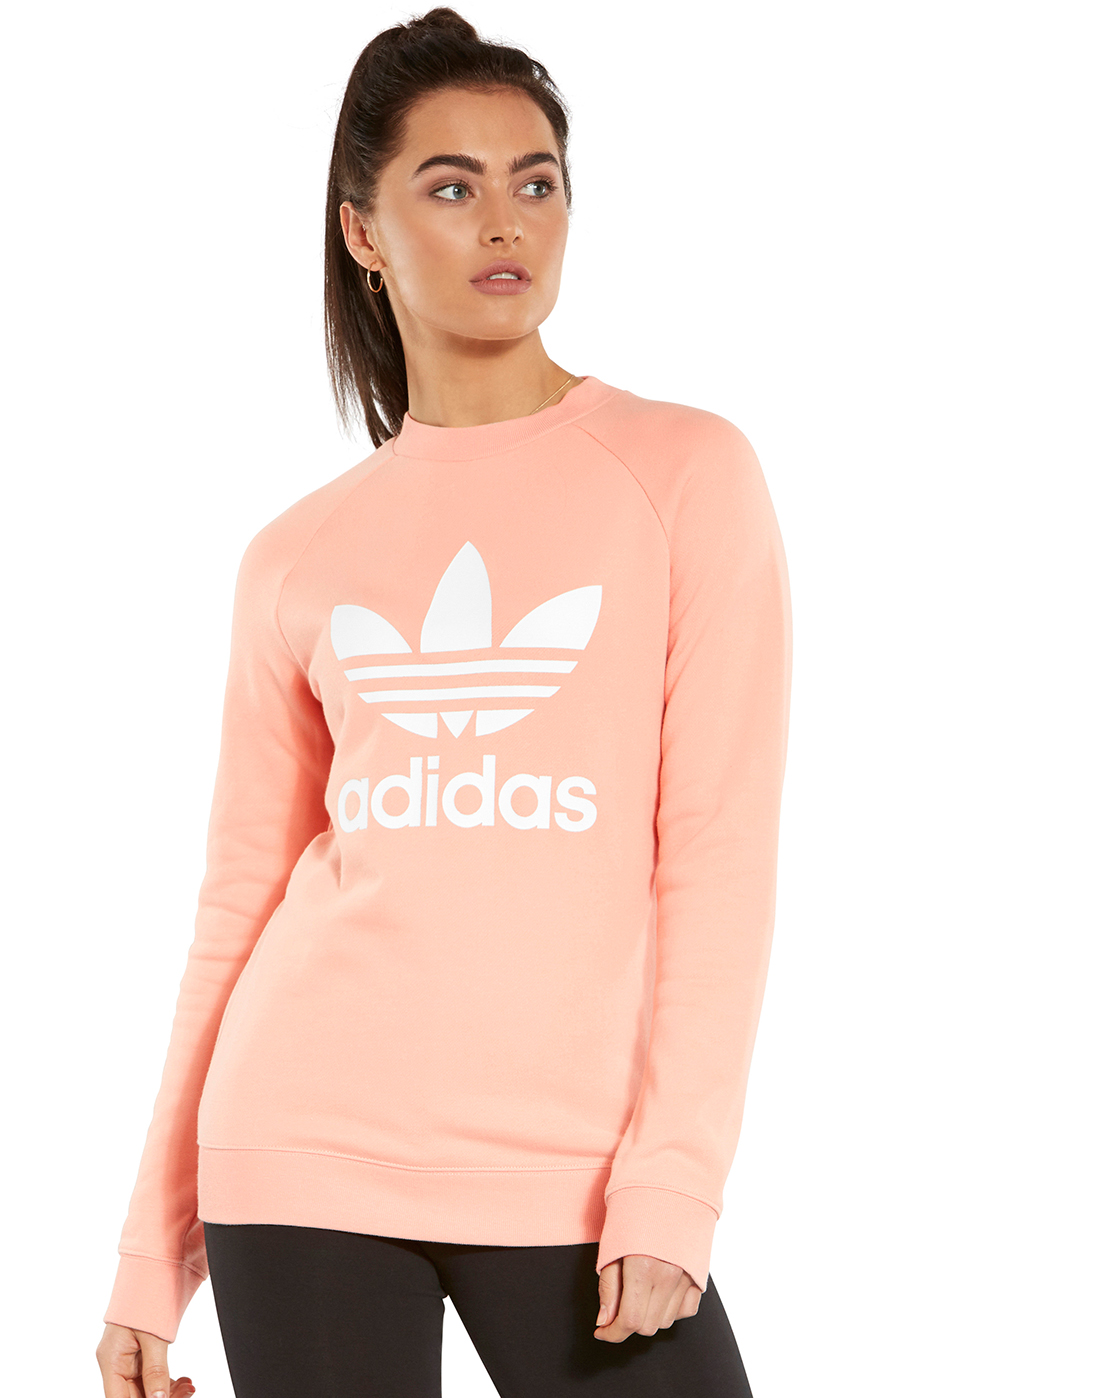 06a4909c2bad adidas Originals. Womens Trefoil Crew Sweatshirt. Womens Trefoil Crew  Sweatshirt ...